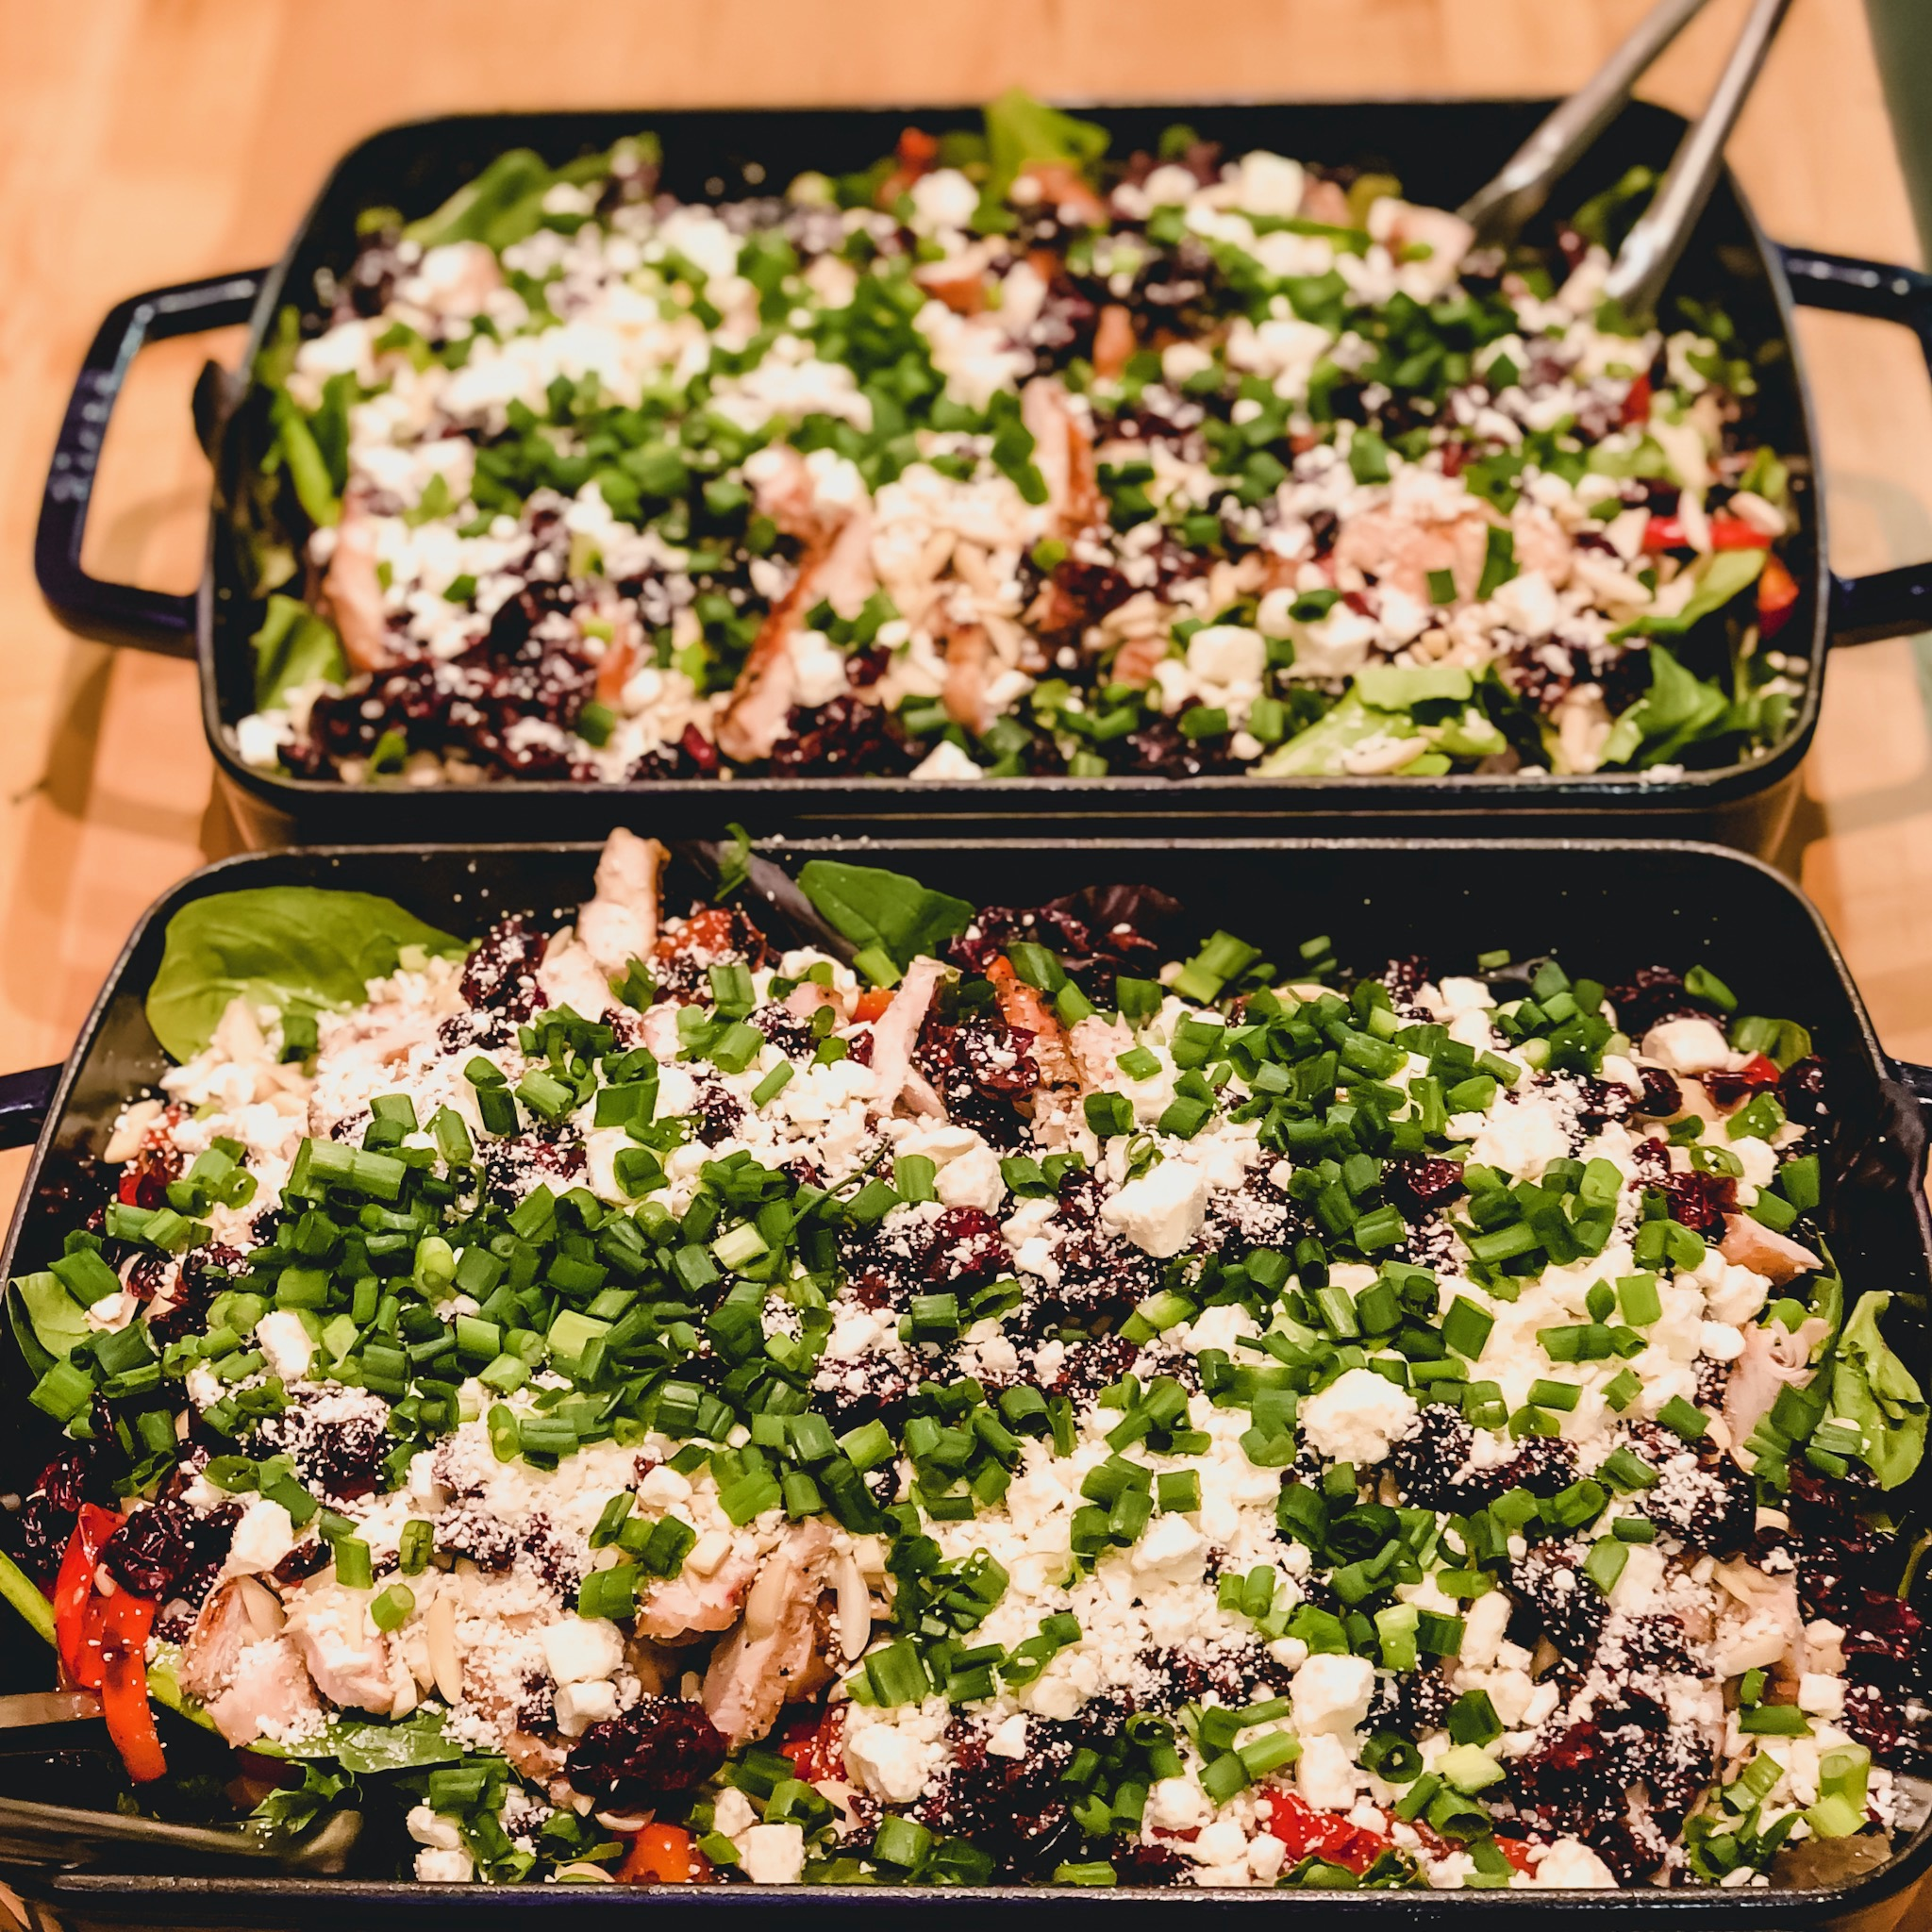 Zesty Chicken Salad - Makes 4 servings360 calories14F / 33C / 25P per serving